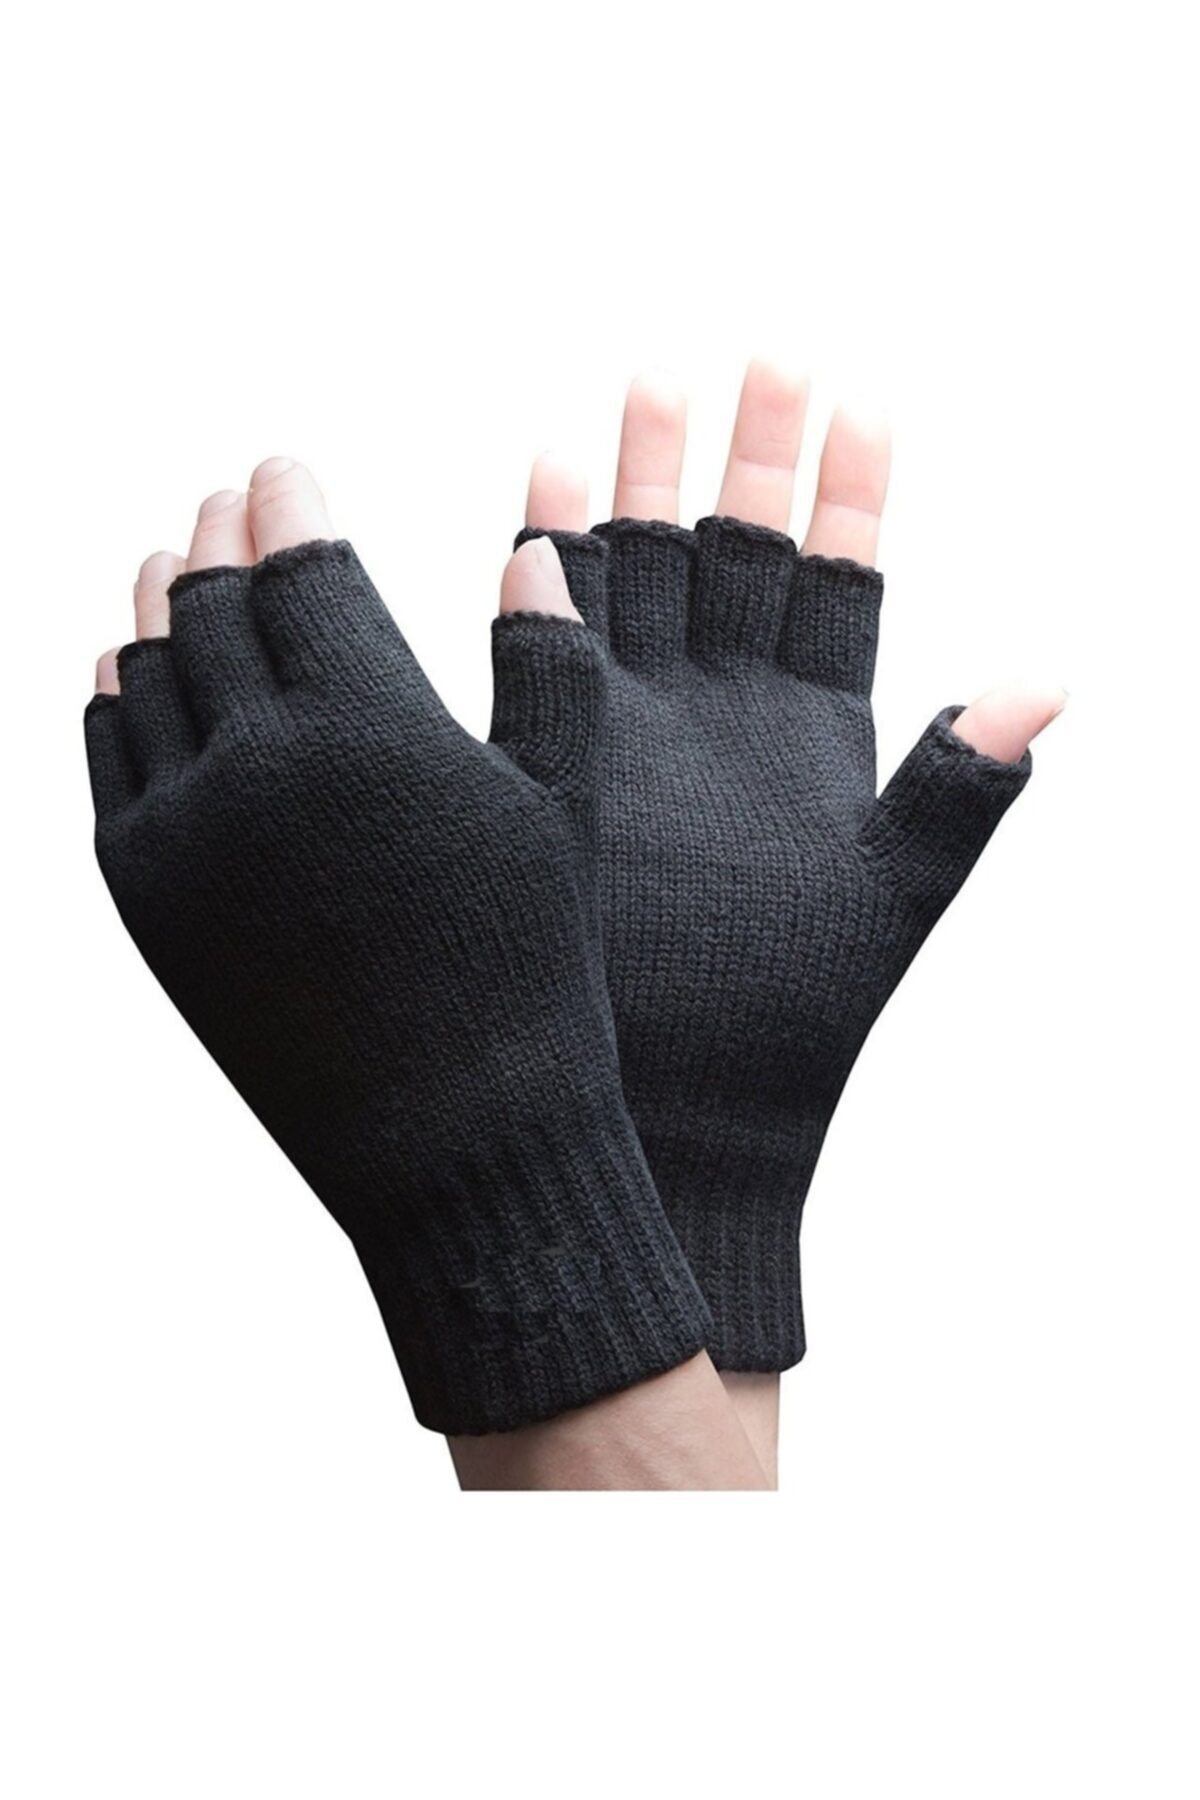 İmerShoes Parmaksız Kesik Yarım Parmak Eldiven Bay Bayan (unisex) Siyah Gri 2